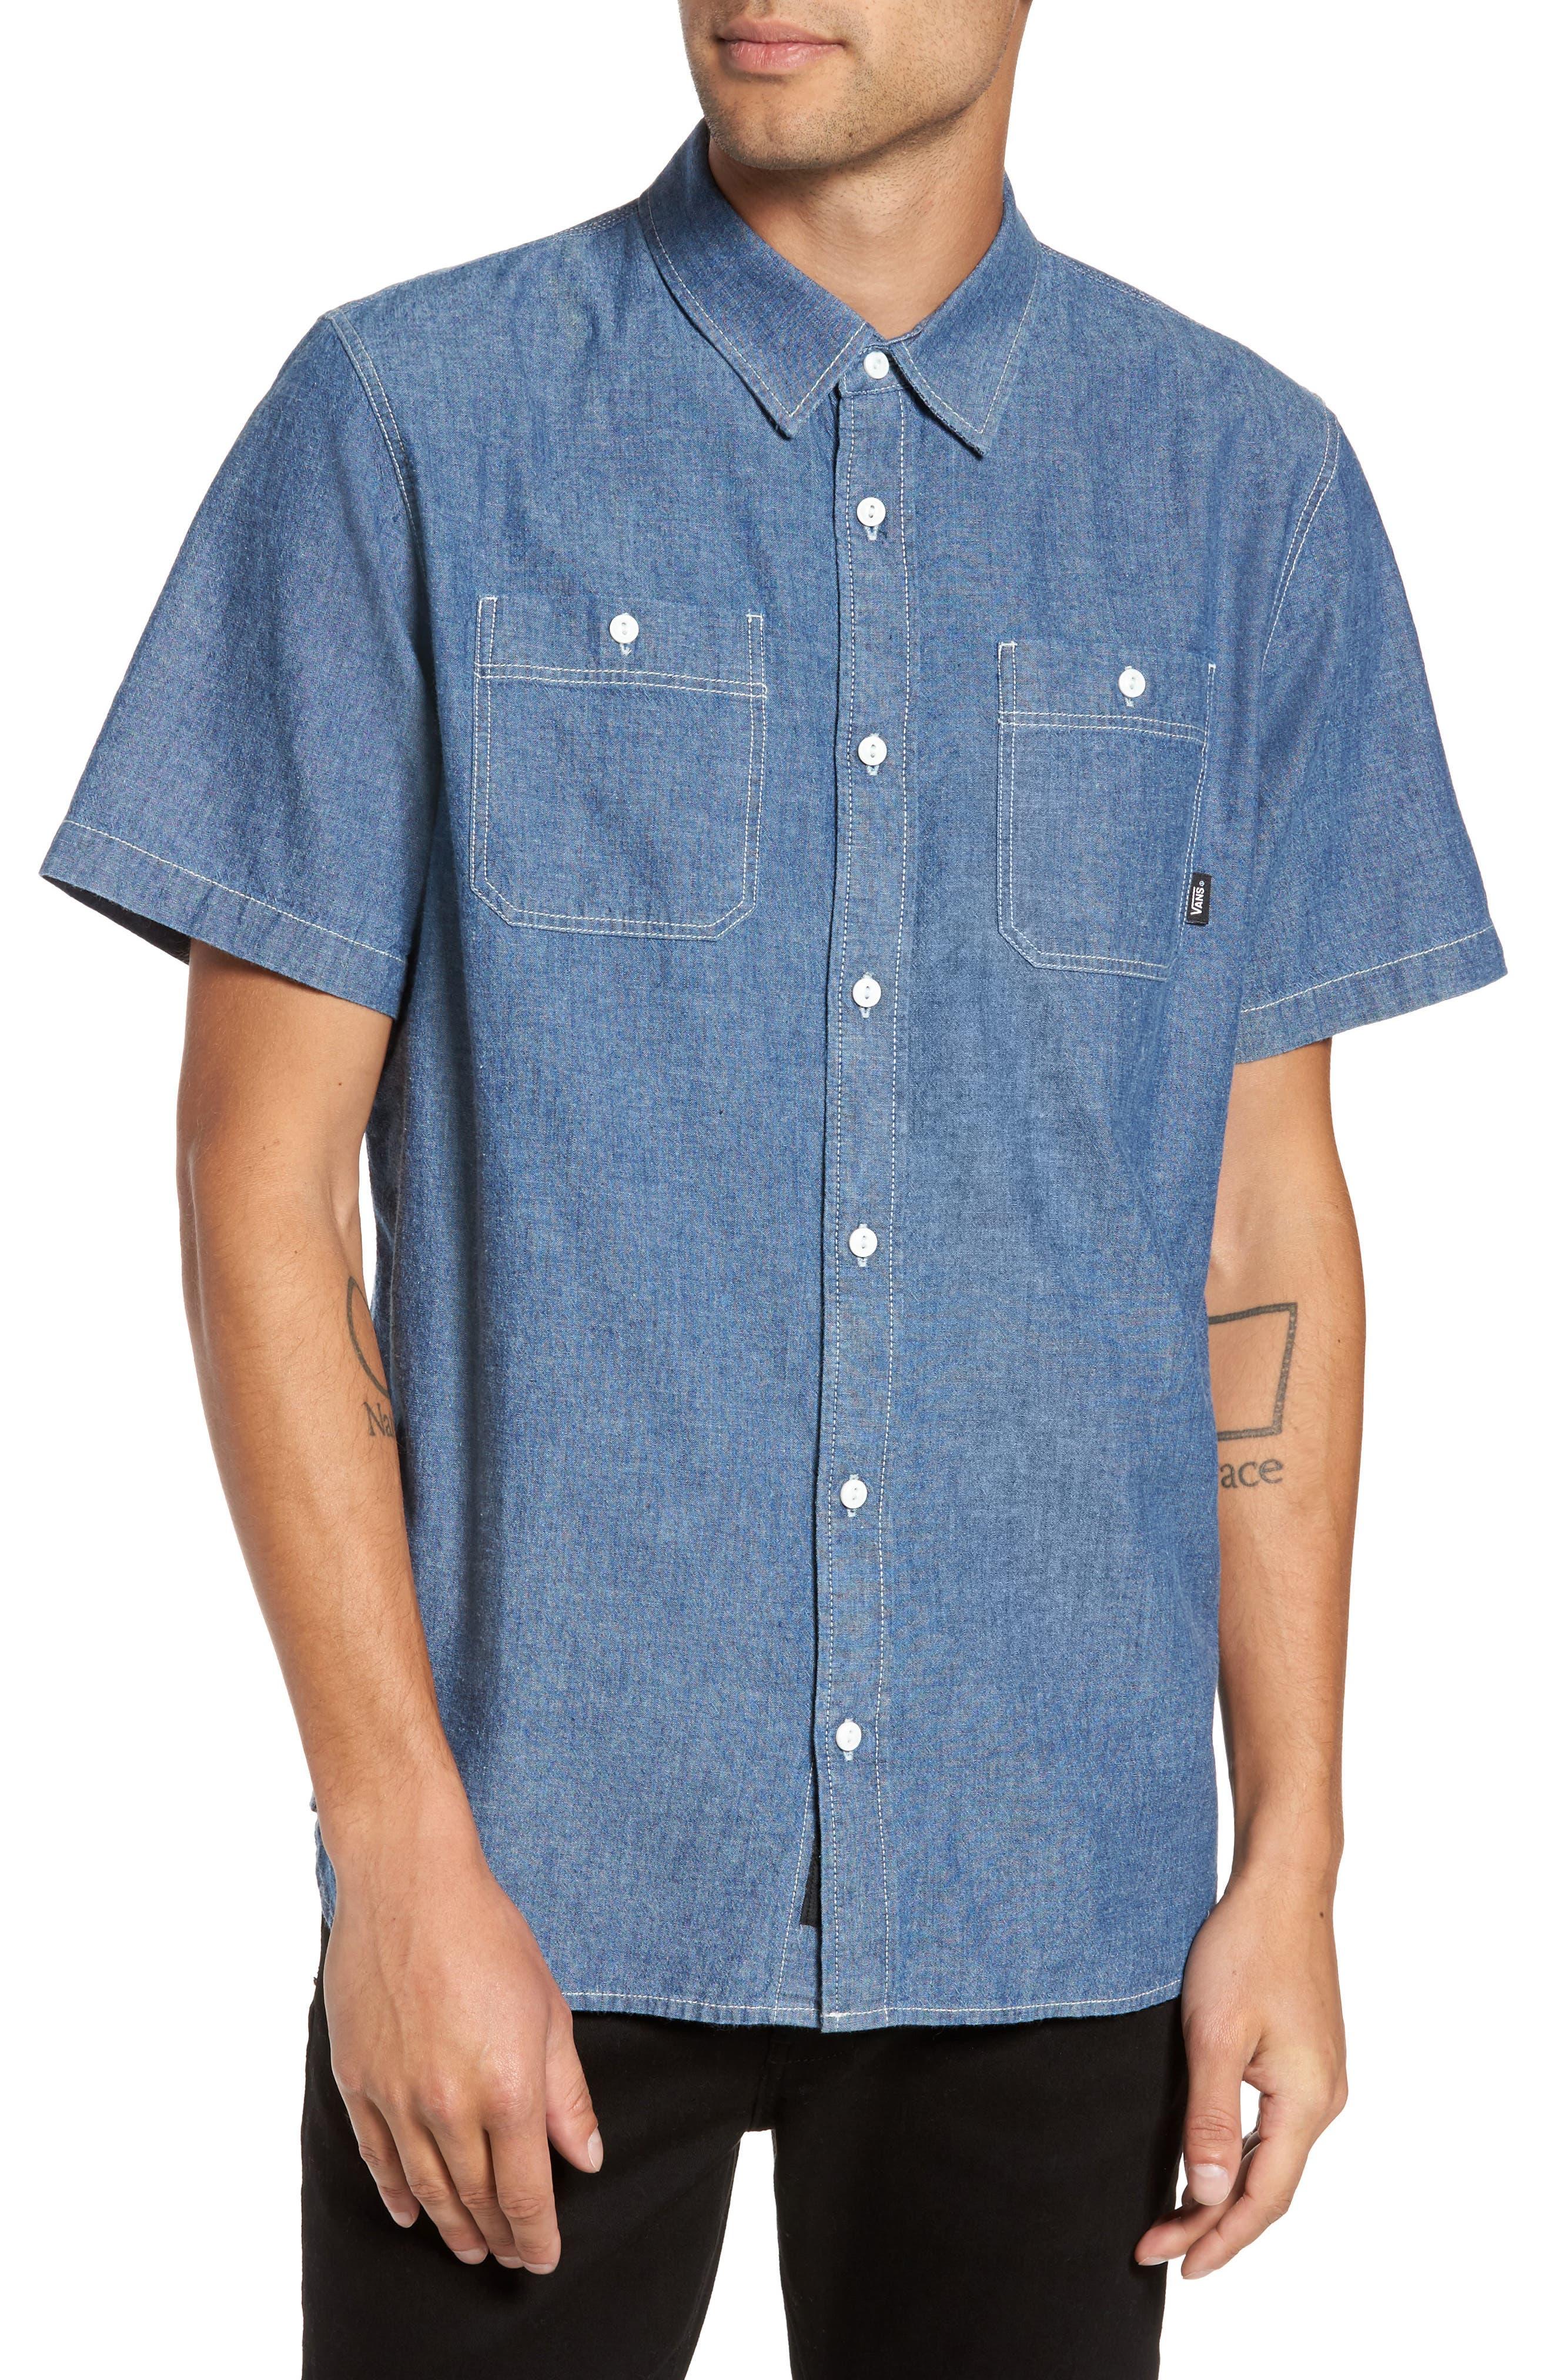 Alternate Image 1 Selected - Vans Carlow Chambray Woven Shirt